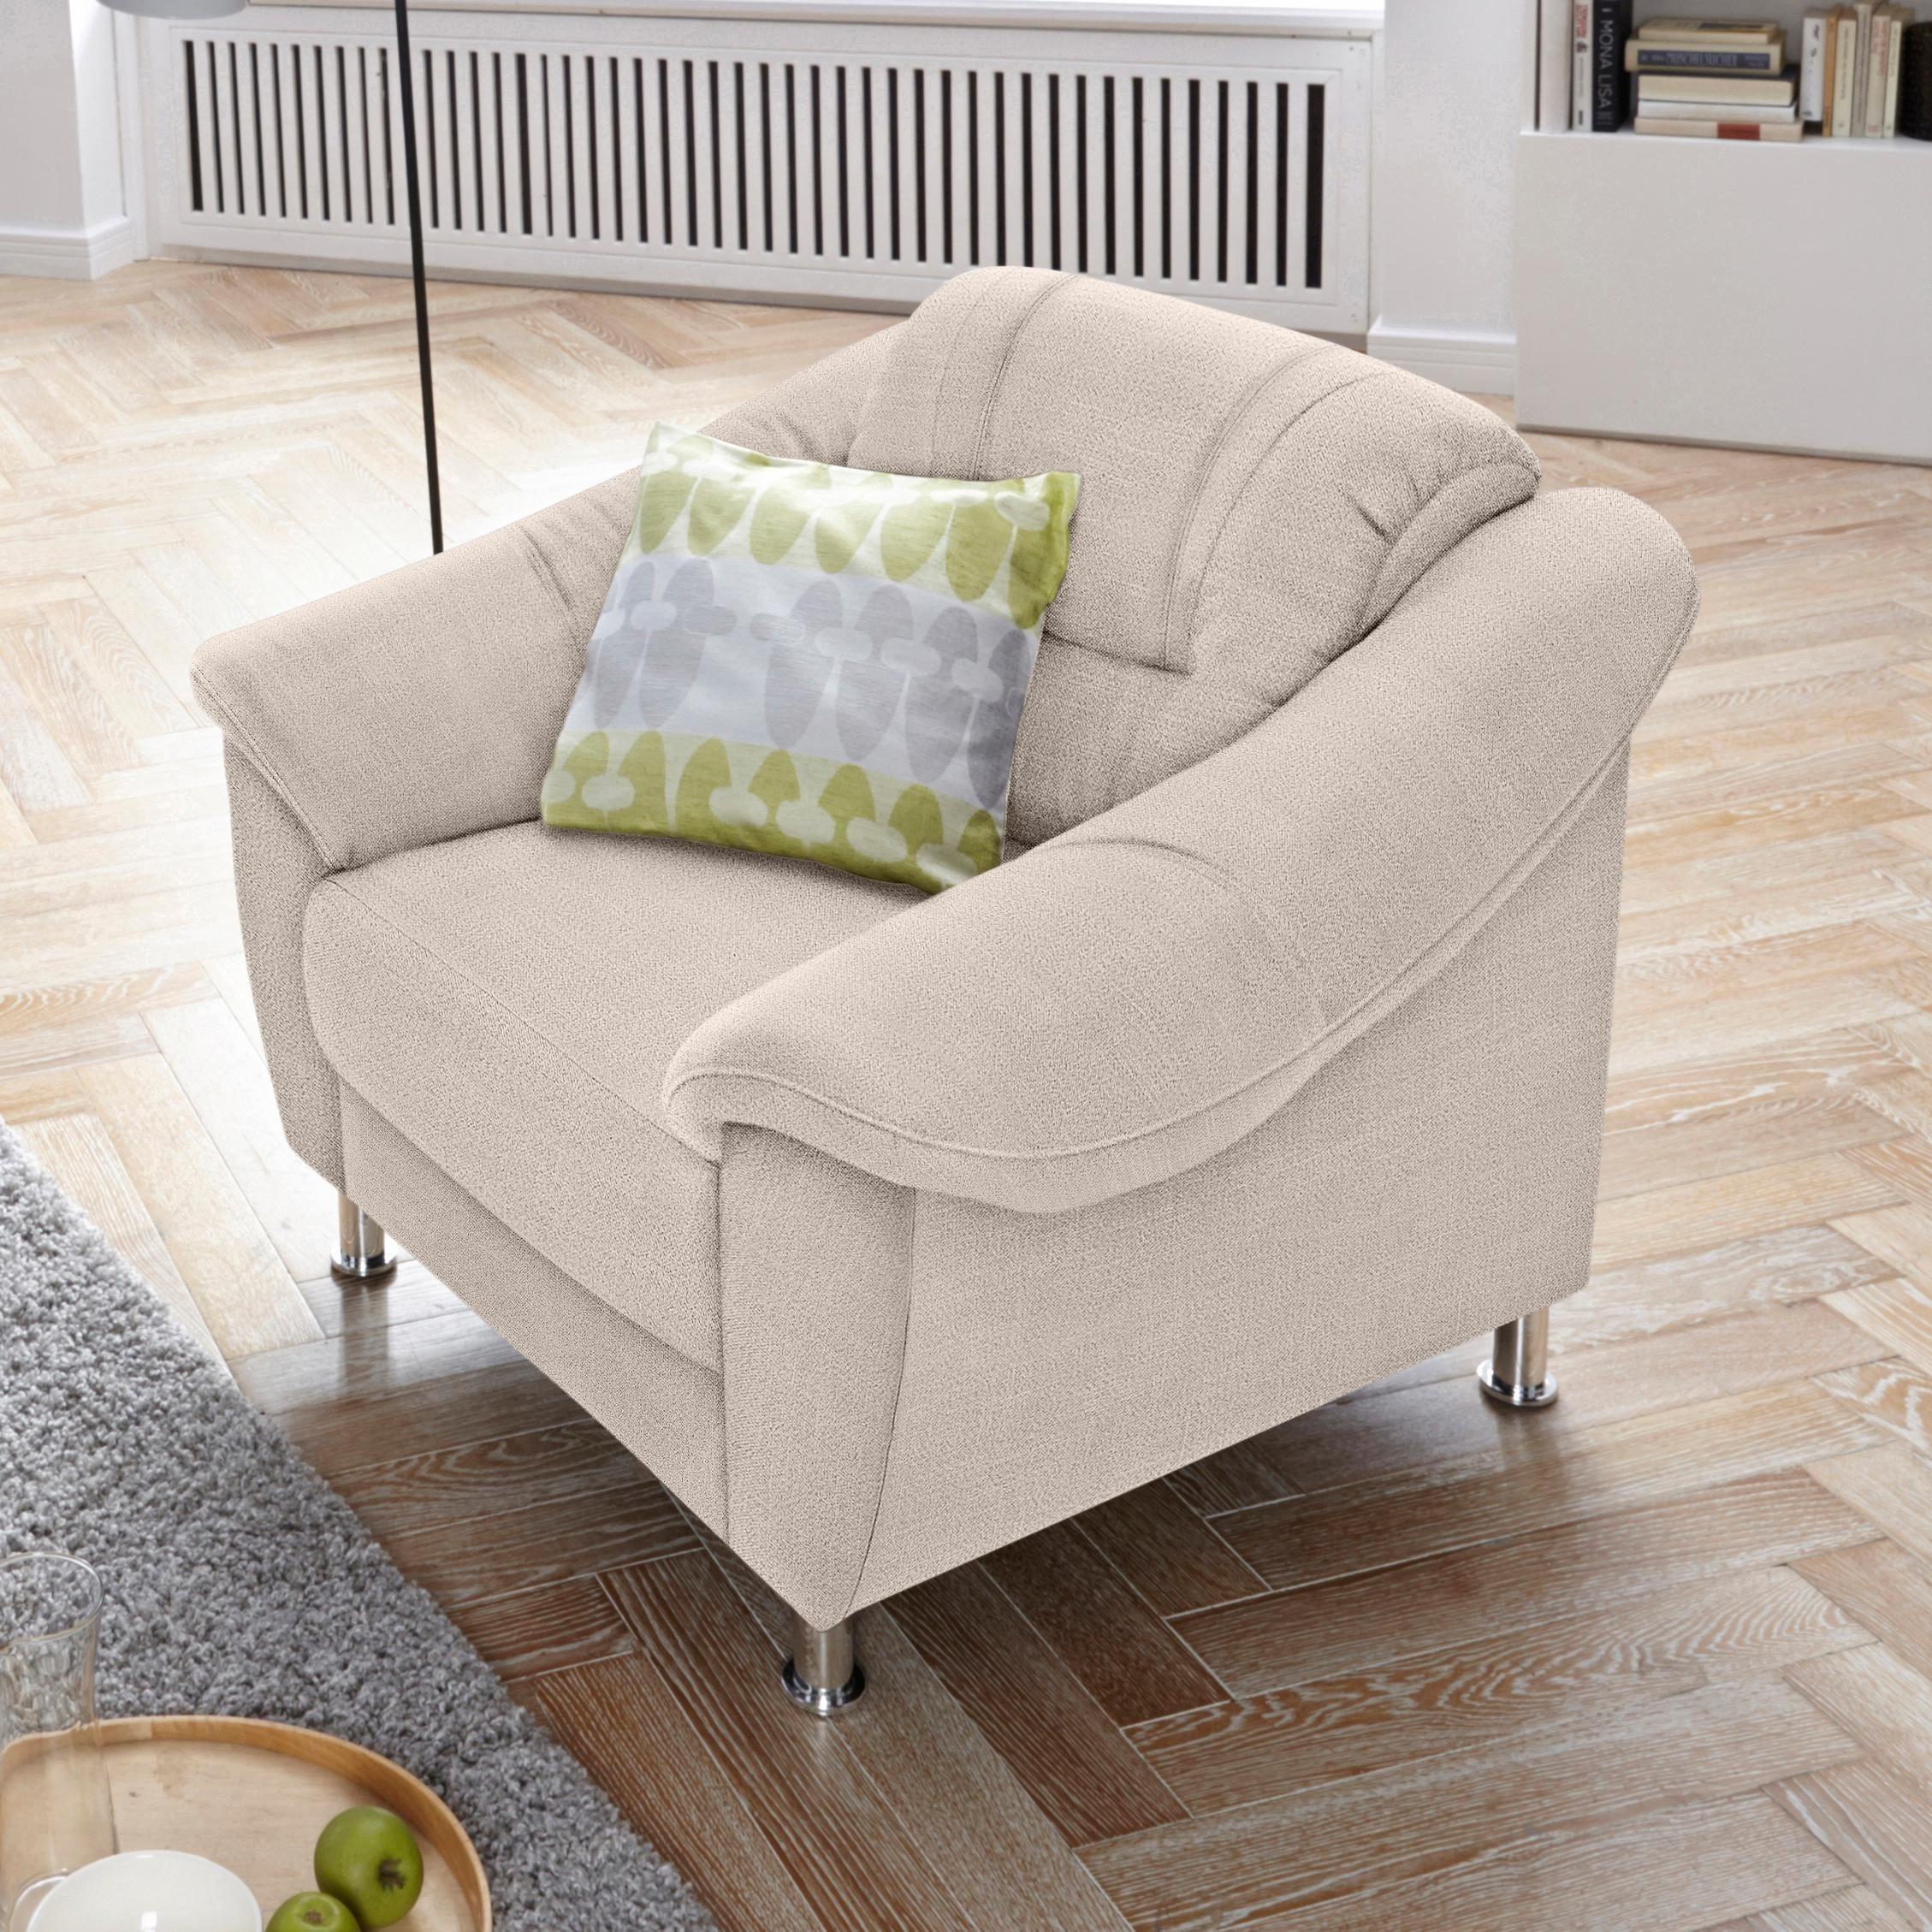 Sit more sessel mit federkern natur online kaufen bei woonio for Sessel natur